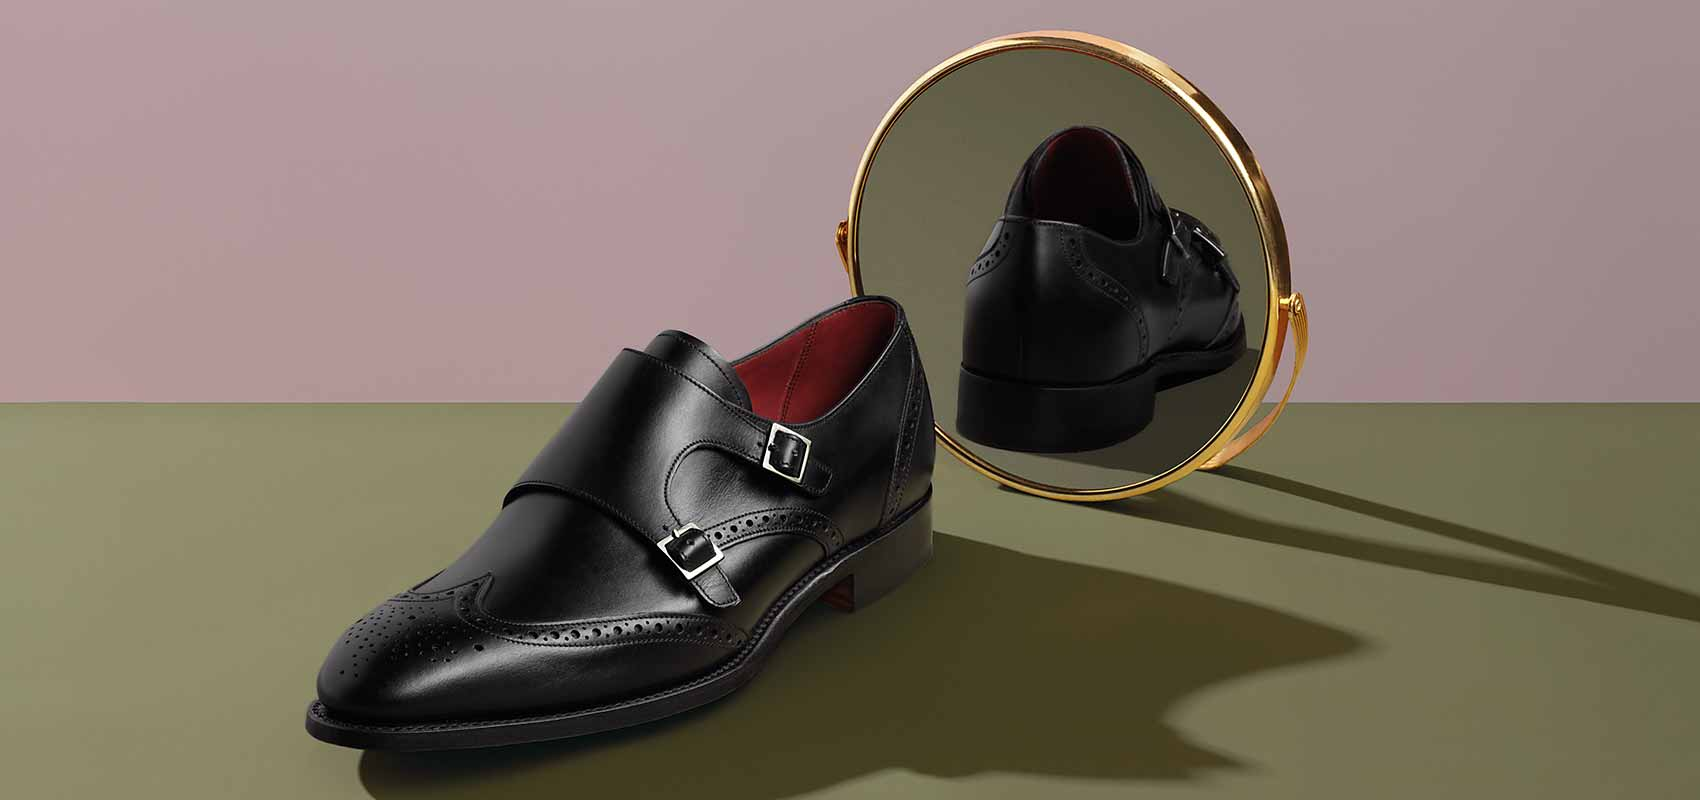 Luxury double Monk shoes